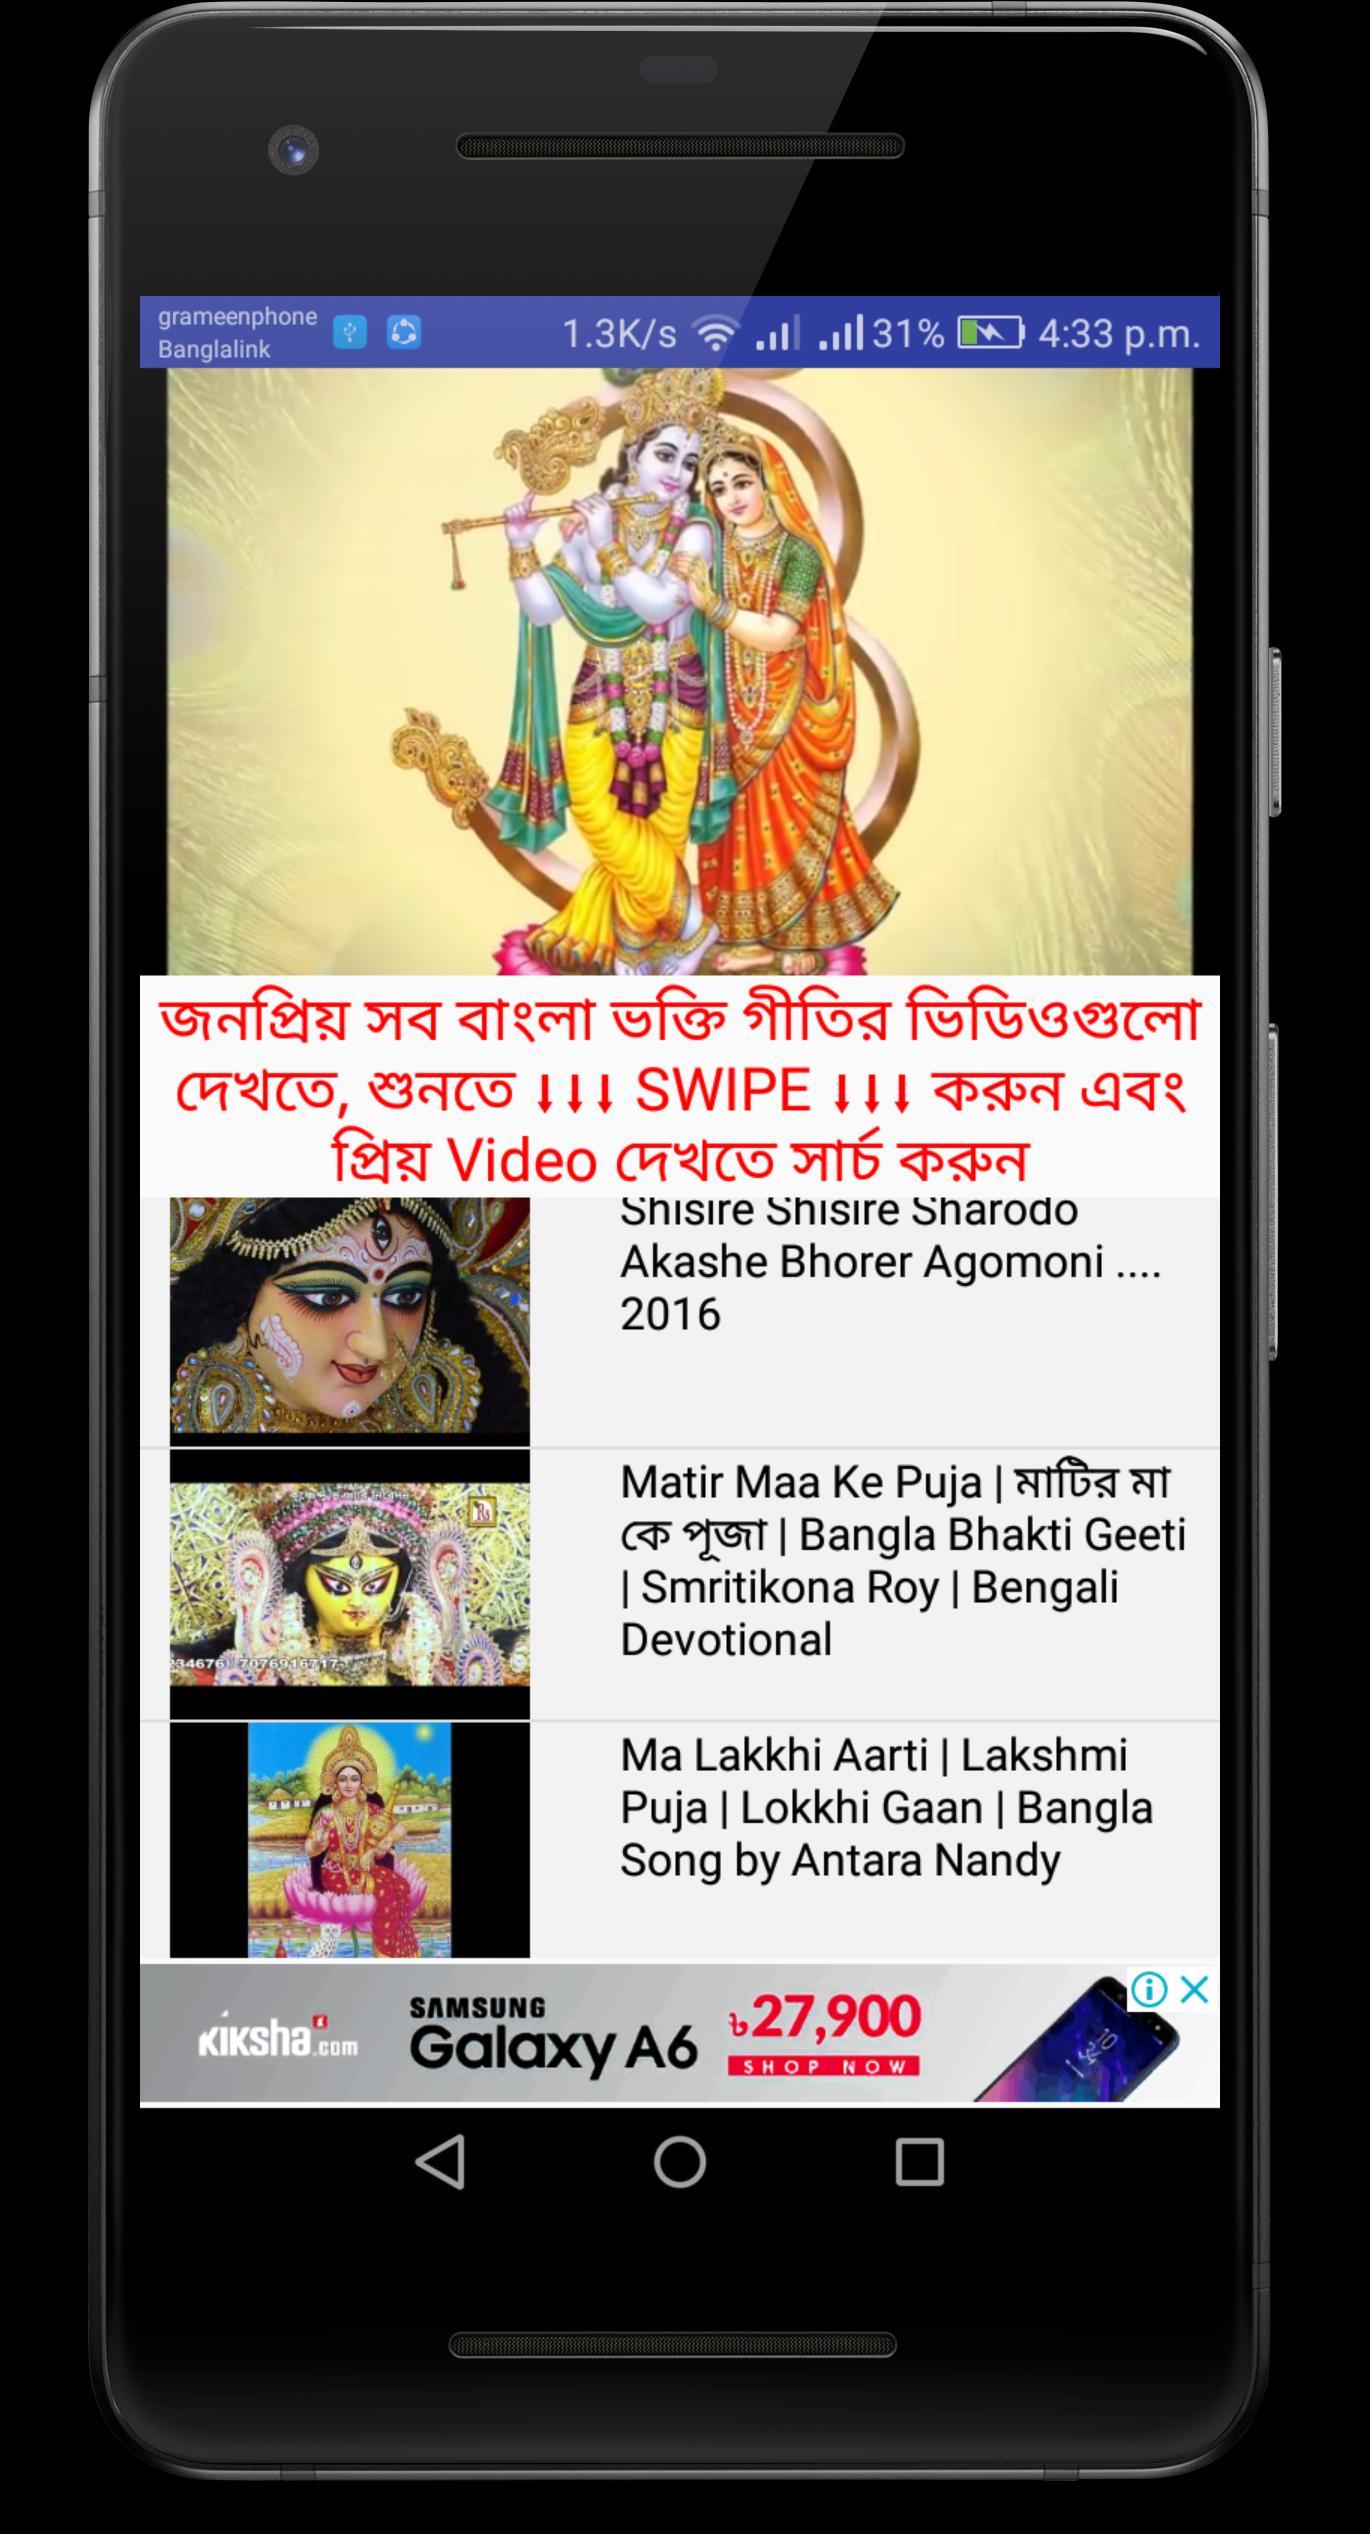 Bangla Bhakti Geeti - বাংলা ভক্তিমূলক গান